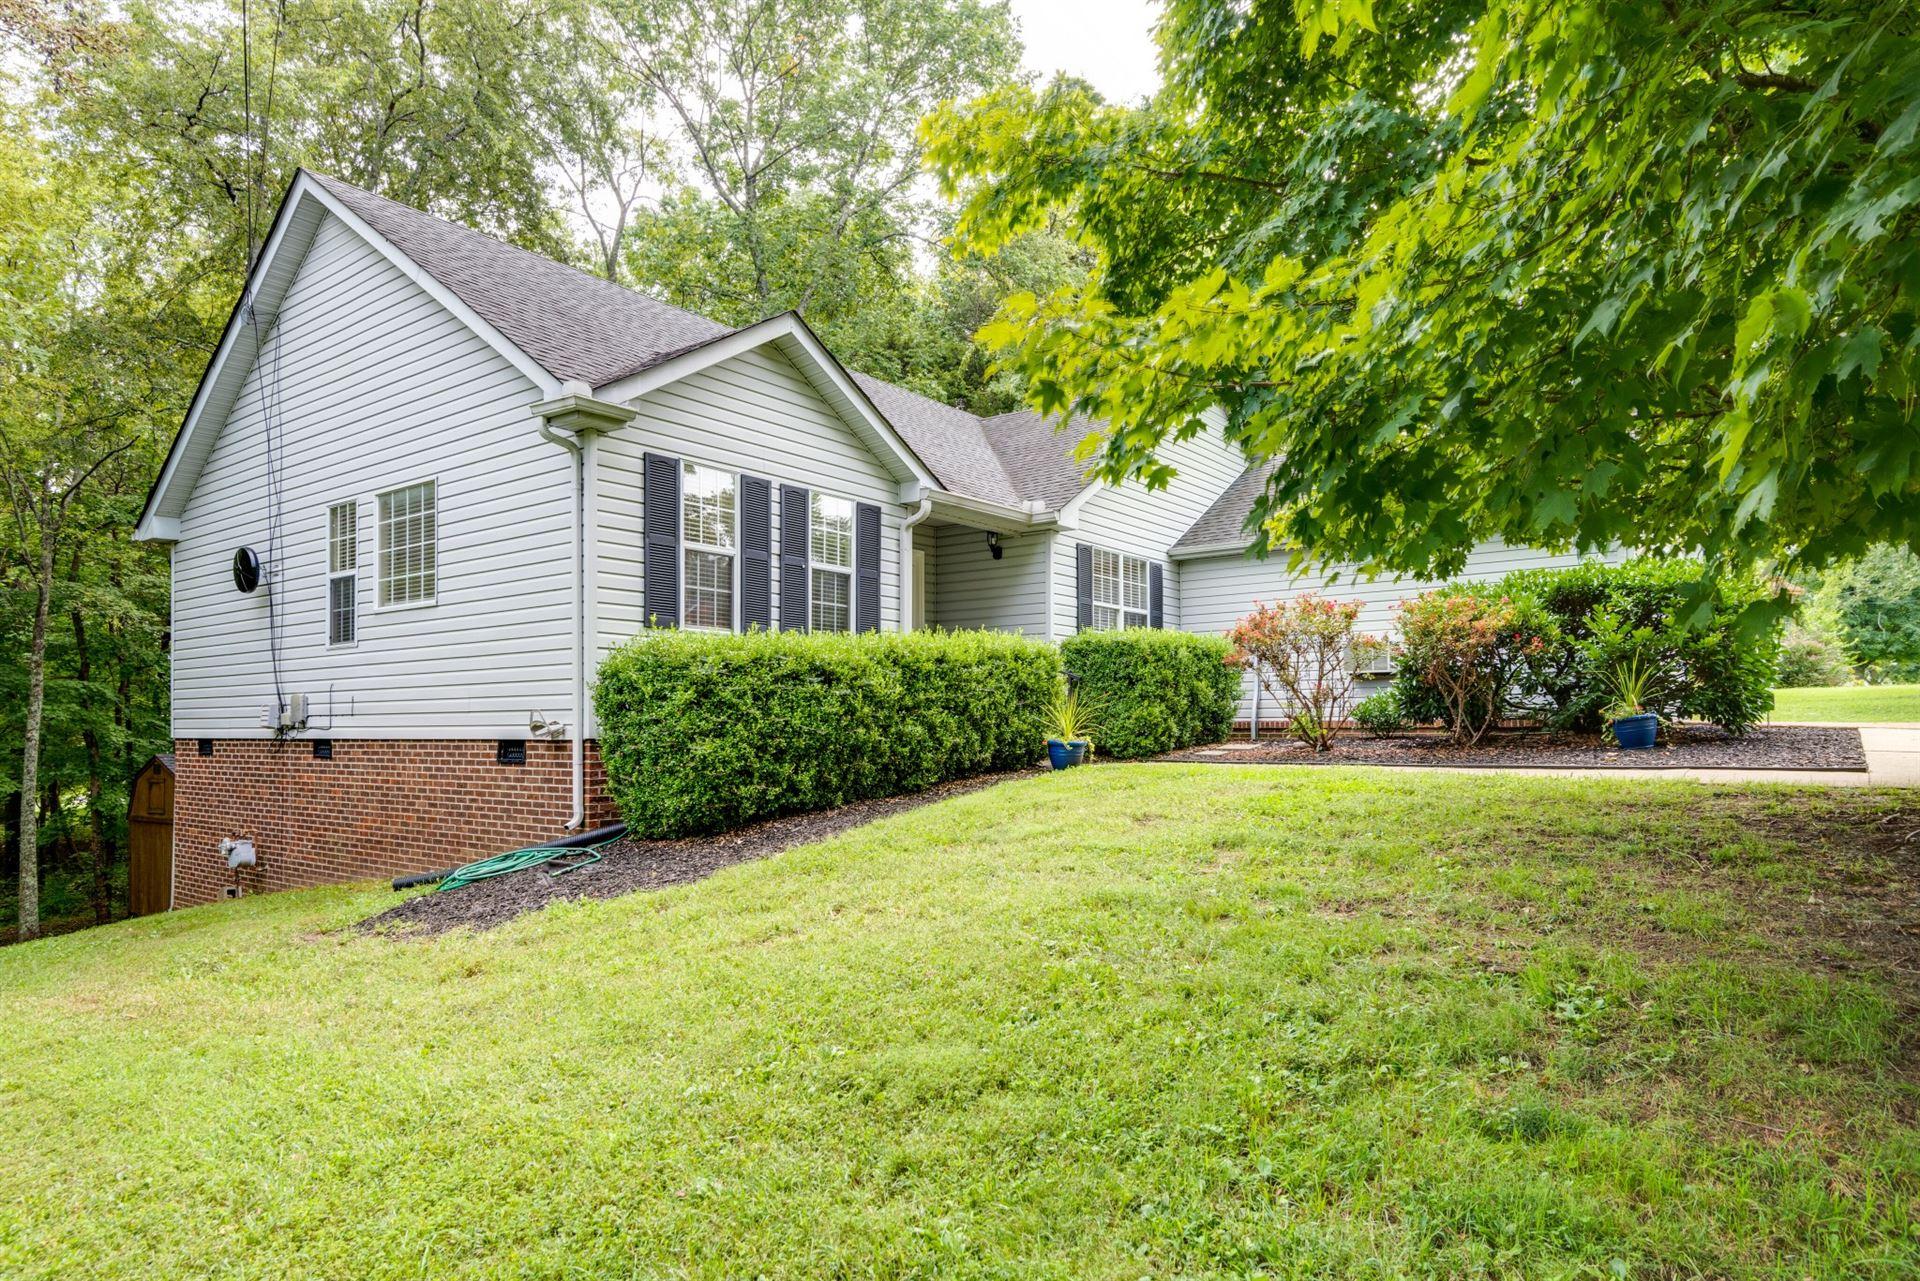 Photo of 858 Stonebrook Blvd, Nolensville, TN 37135 (MLS # 2191155)